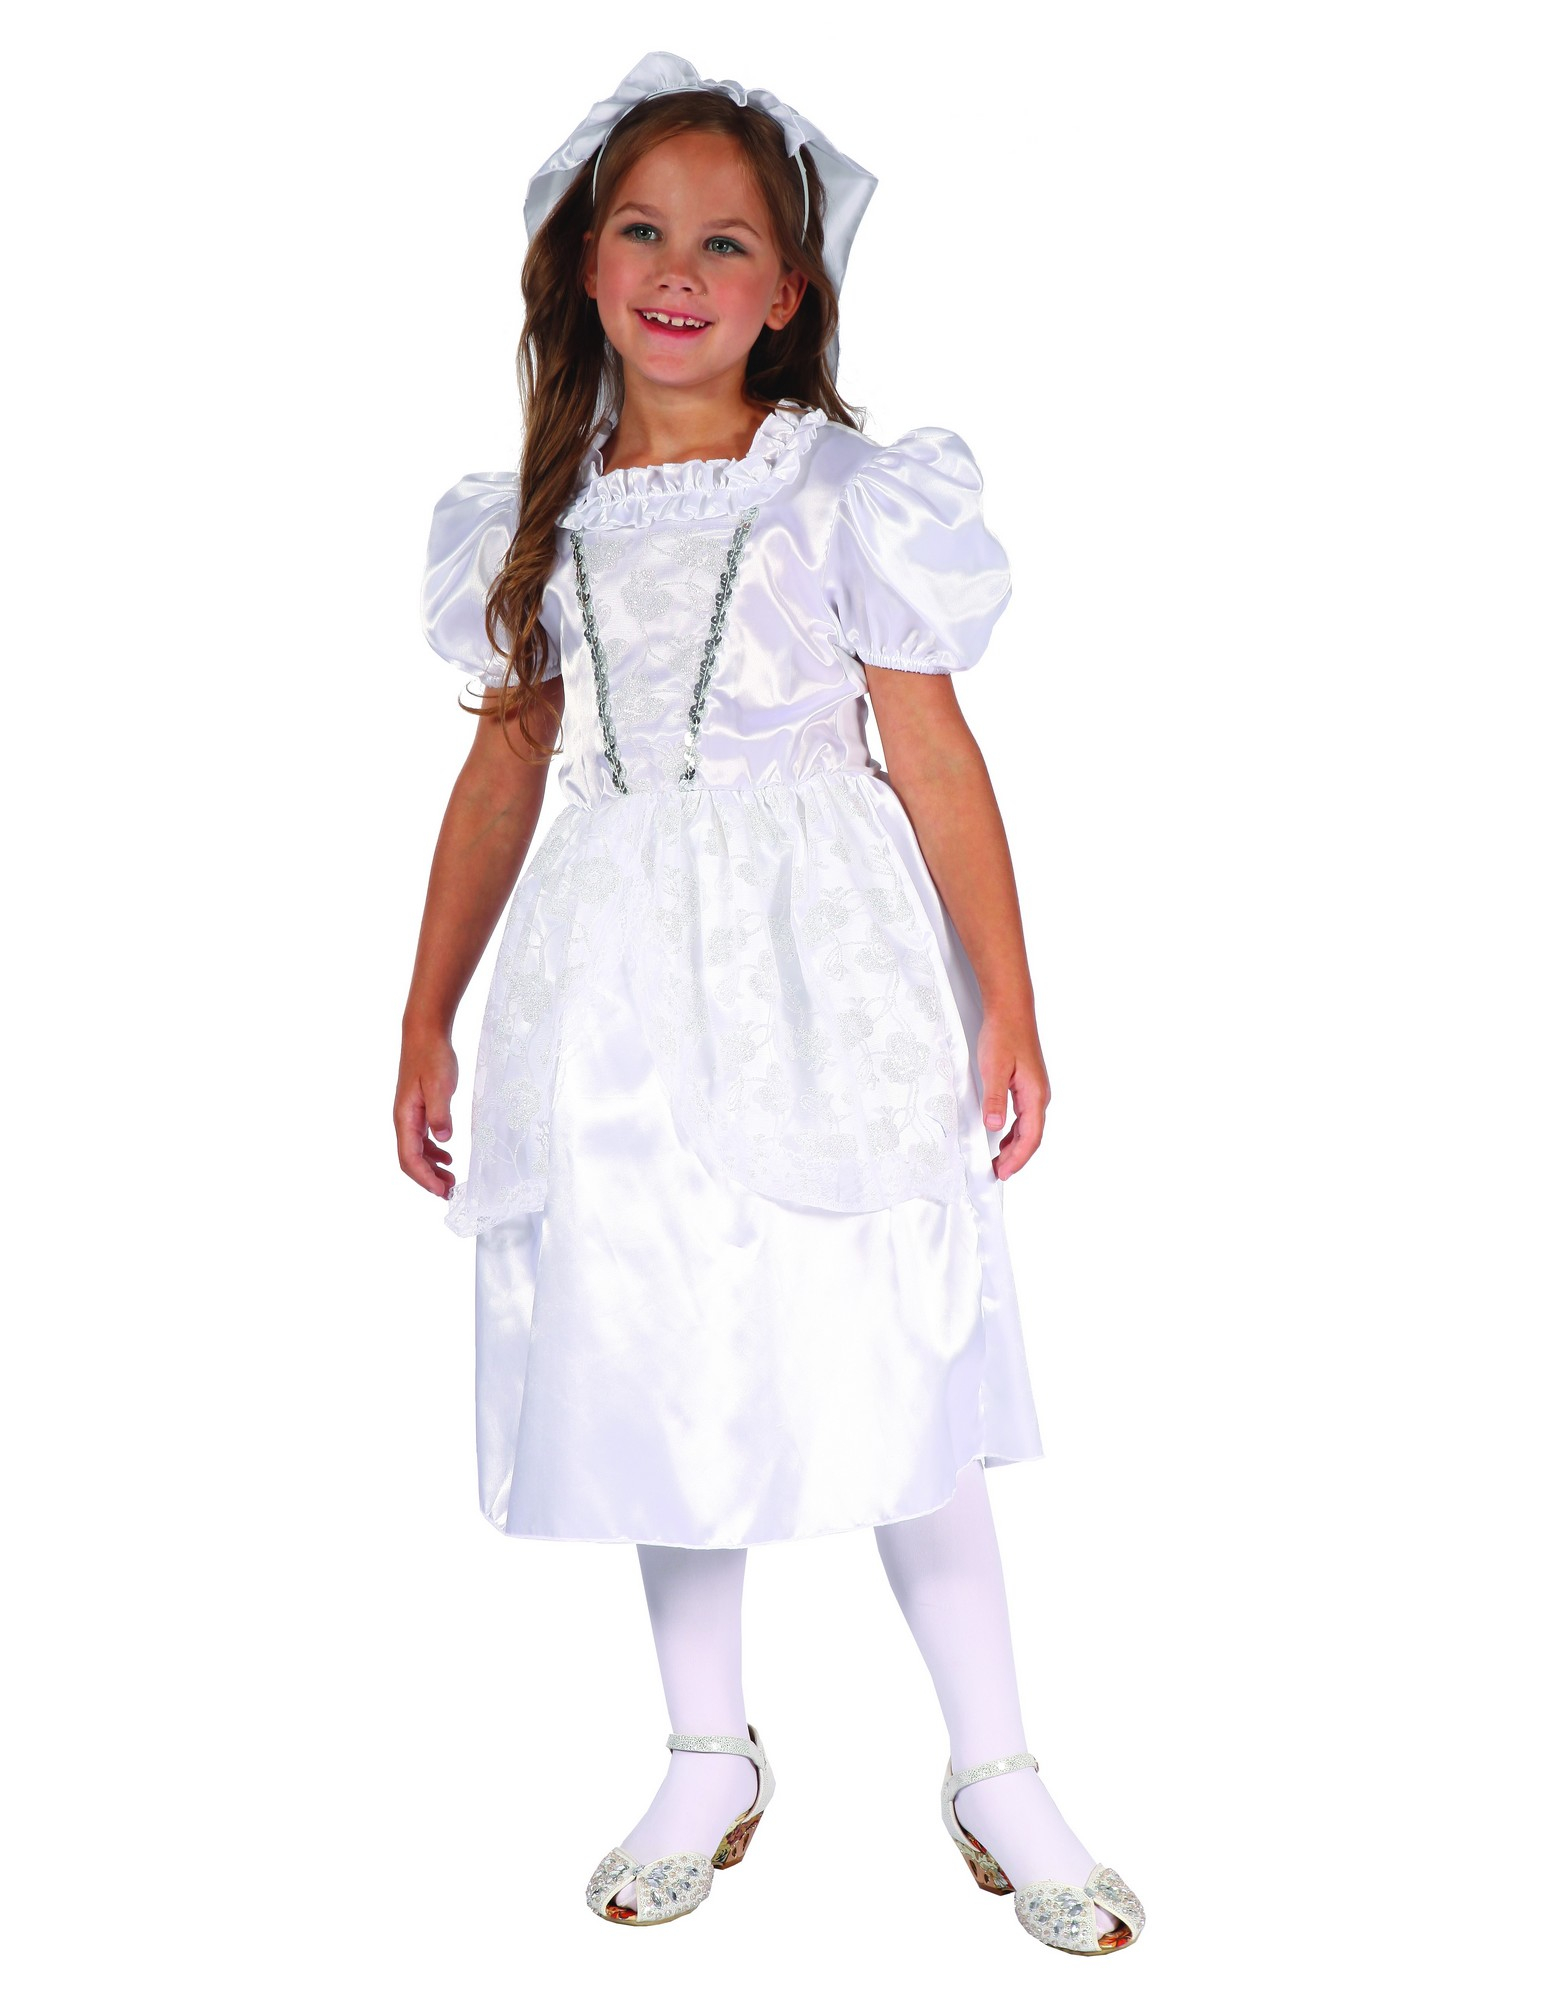 0903072626ba Costume da sposa in bianco per bambina